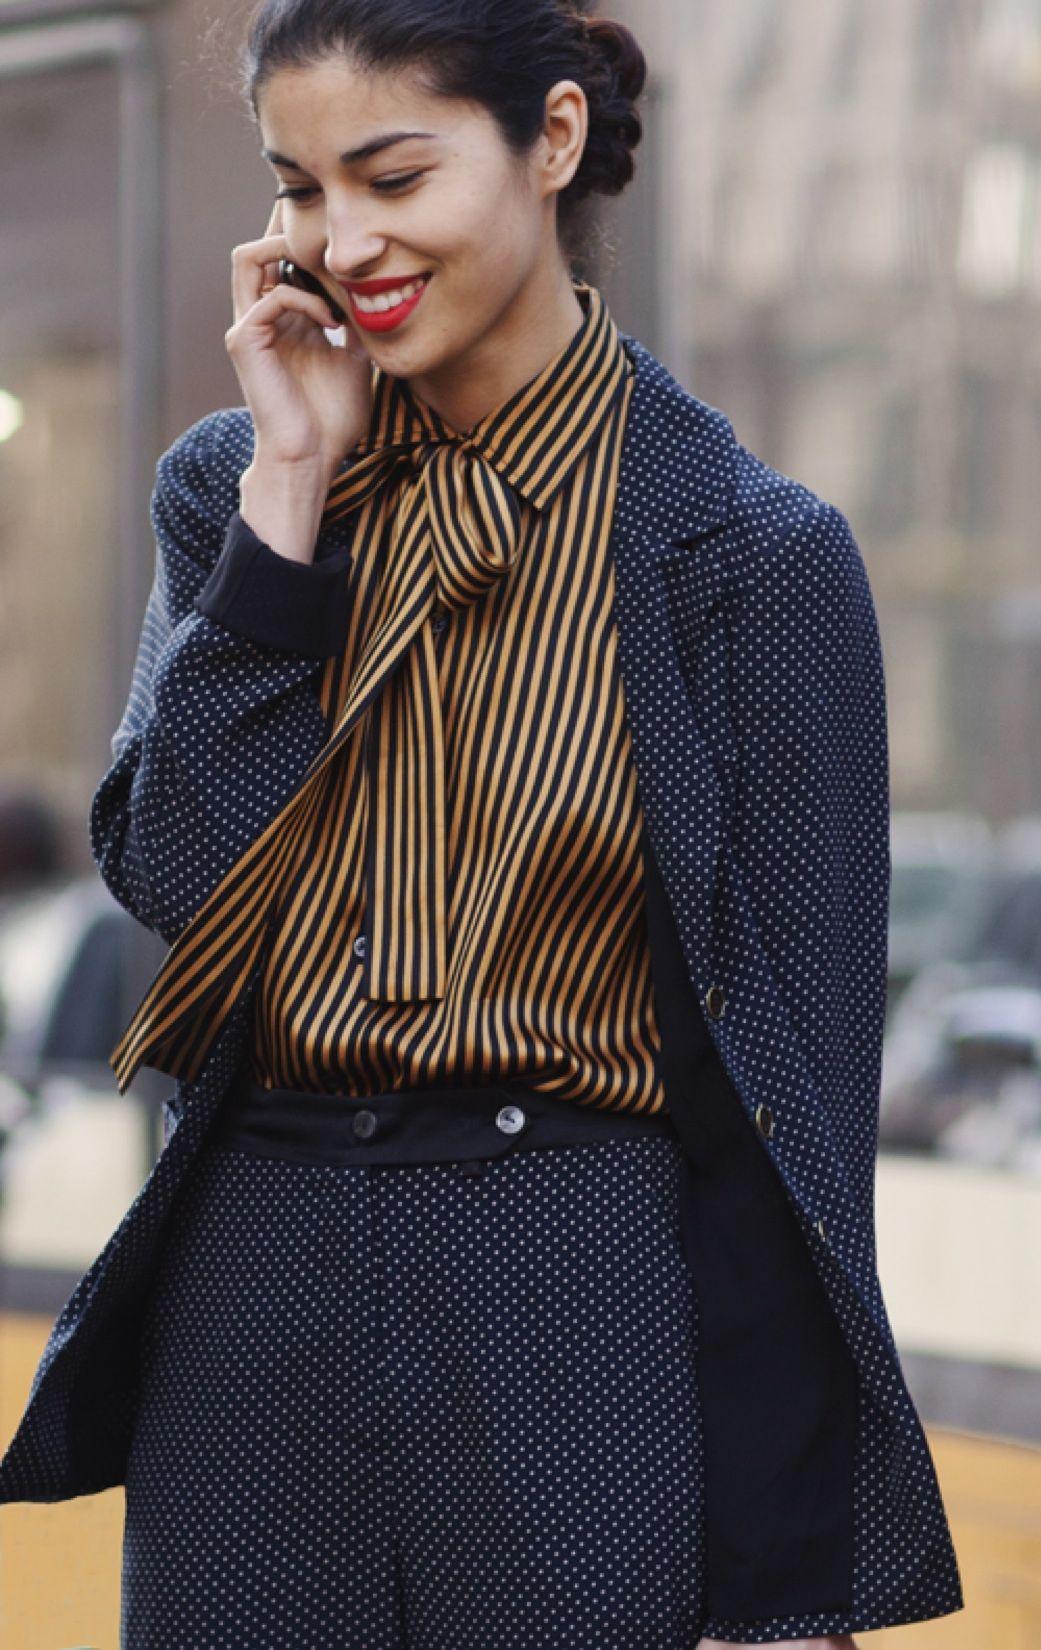 Caroline by The Sartorialist @caroissa @Sartorialist. This style is so subtle, powerful and feminine,